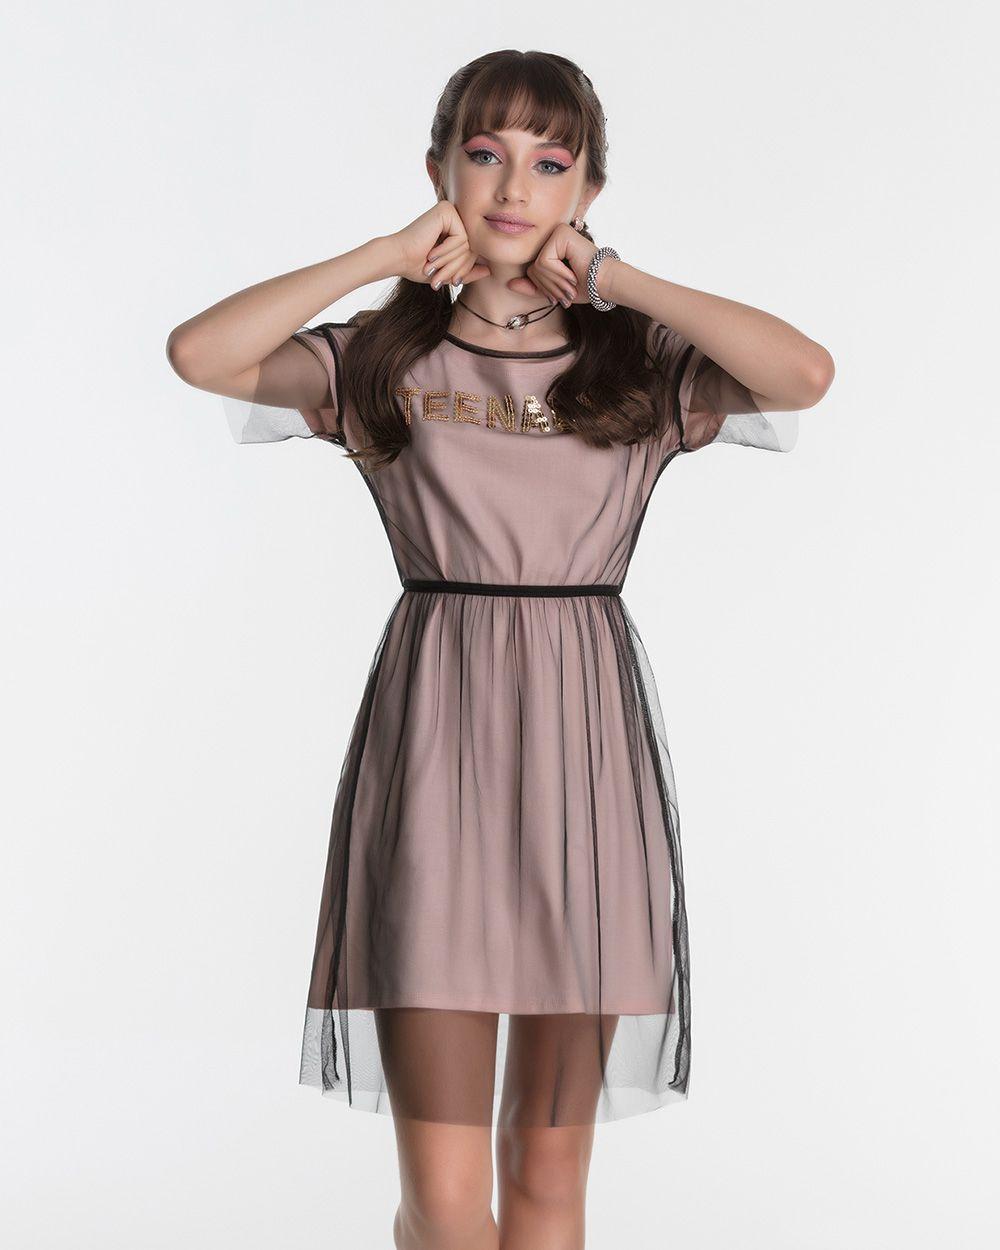 Vestido Menina Bobbylulu Teenager Sobreposição 20S345